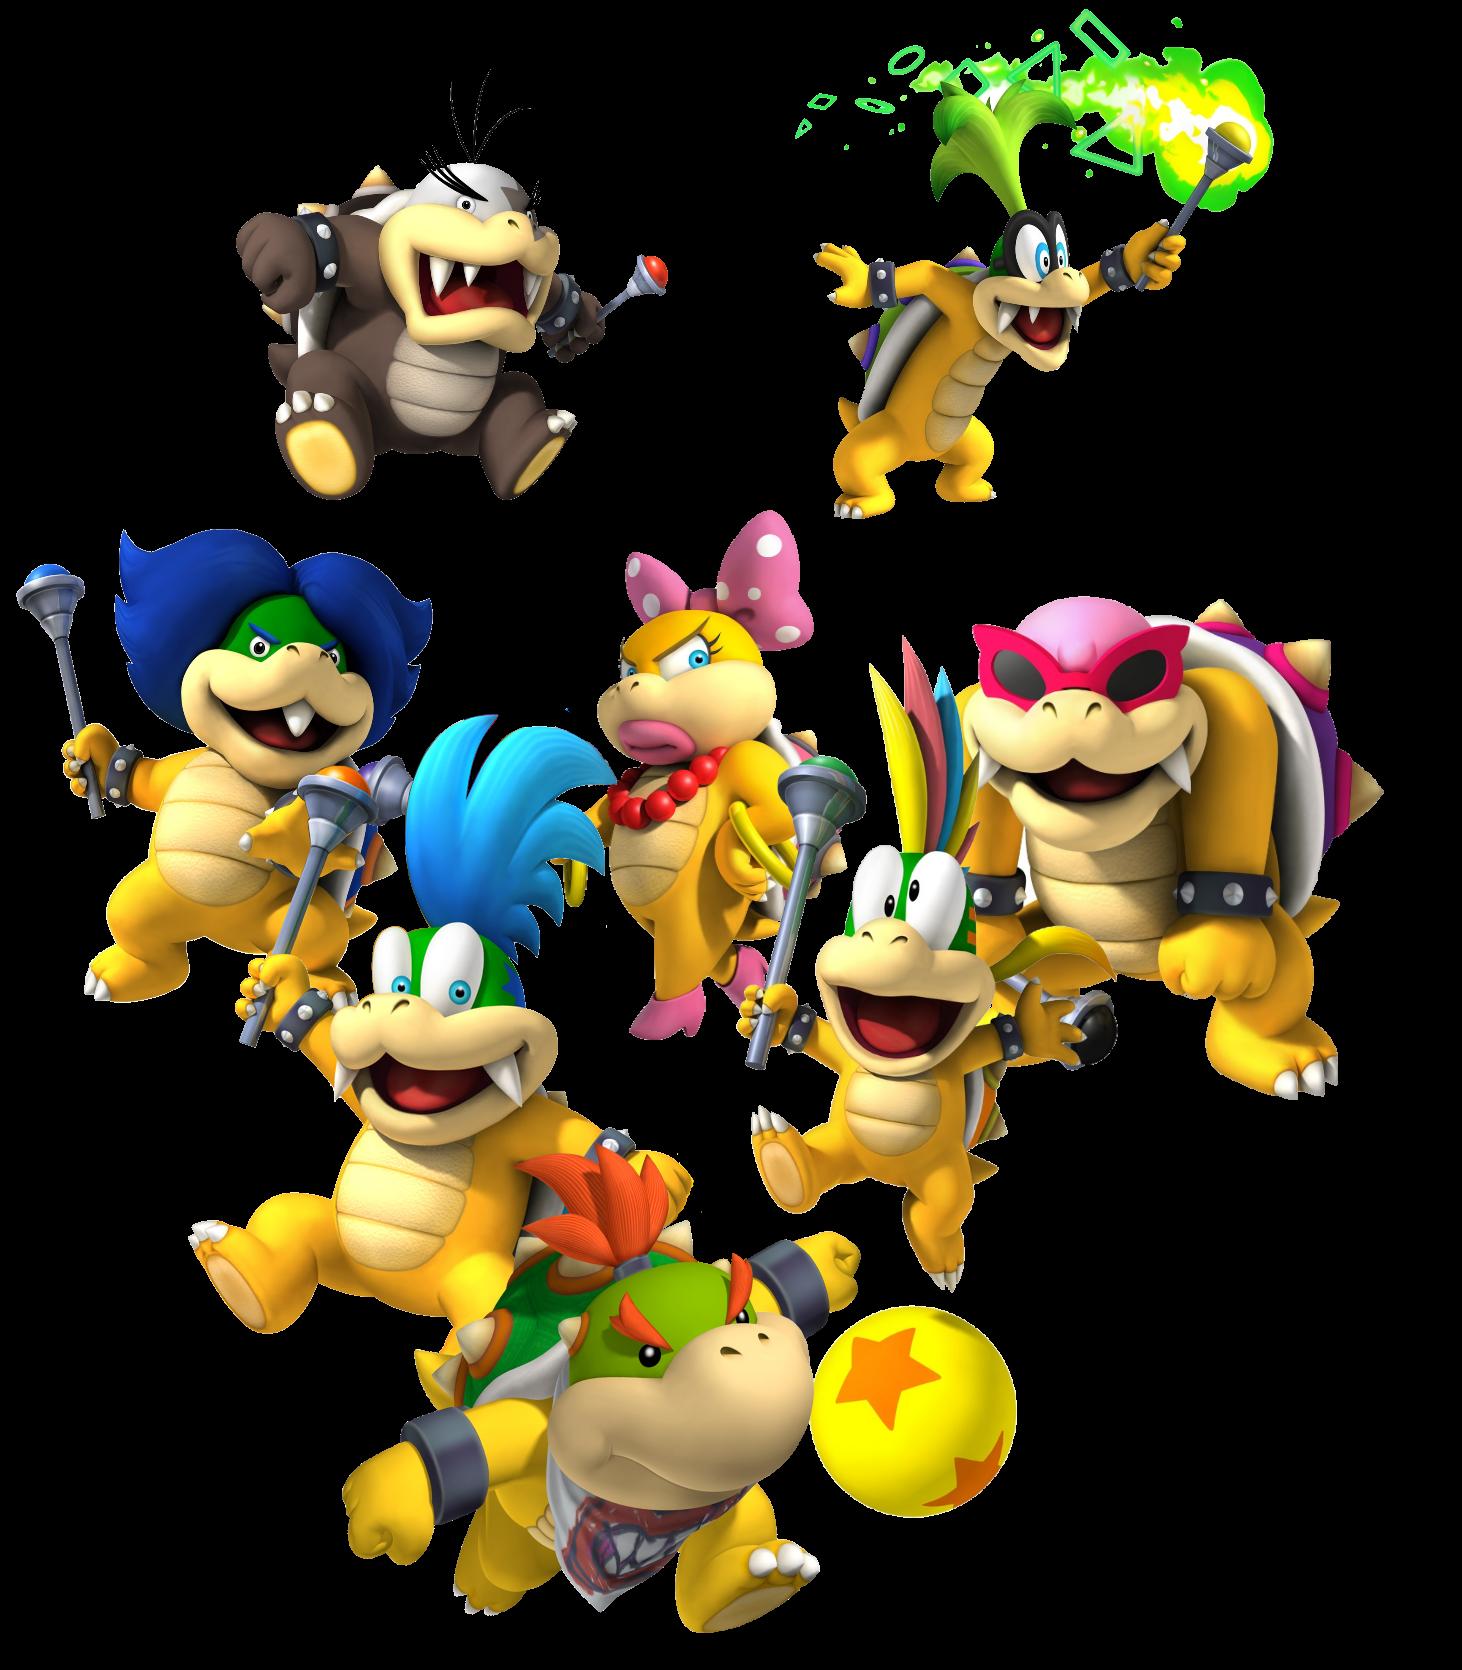 Image 8 Koopalings Png Fantendo Nintendo Fanon Wiki